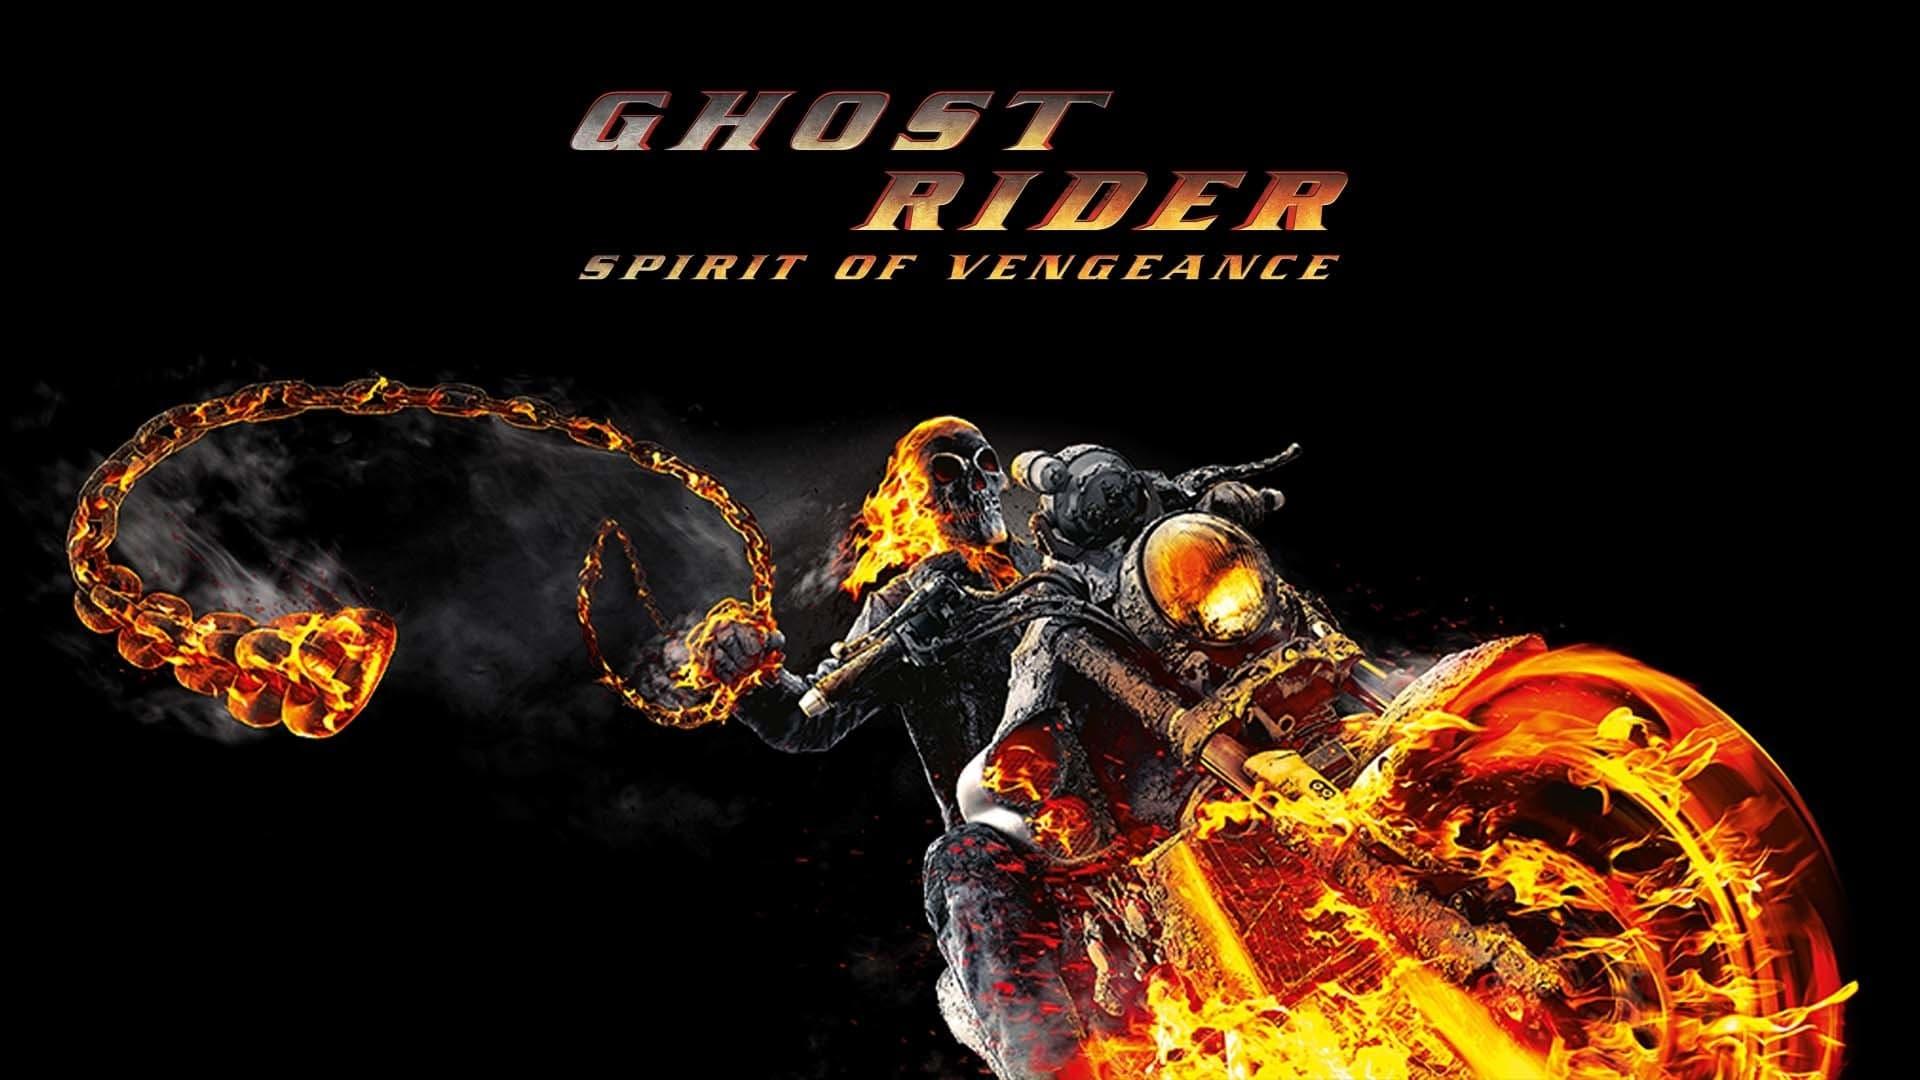 Ghost Rider: Spirit of Vengeance (2011) - AZ Movies